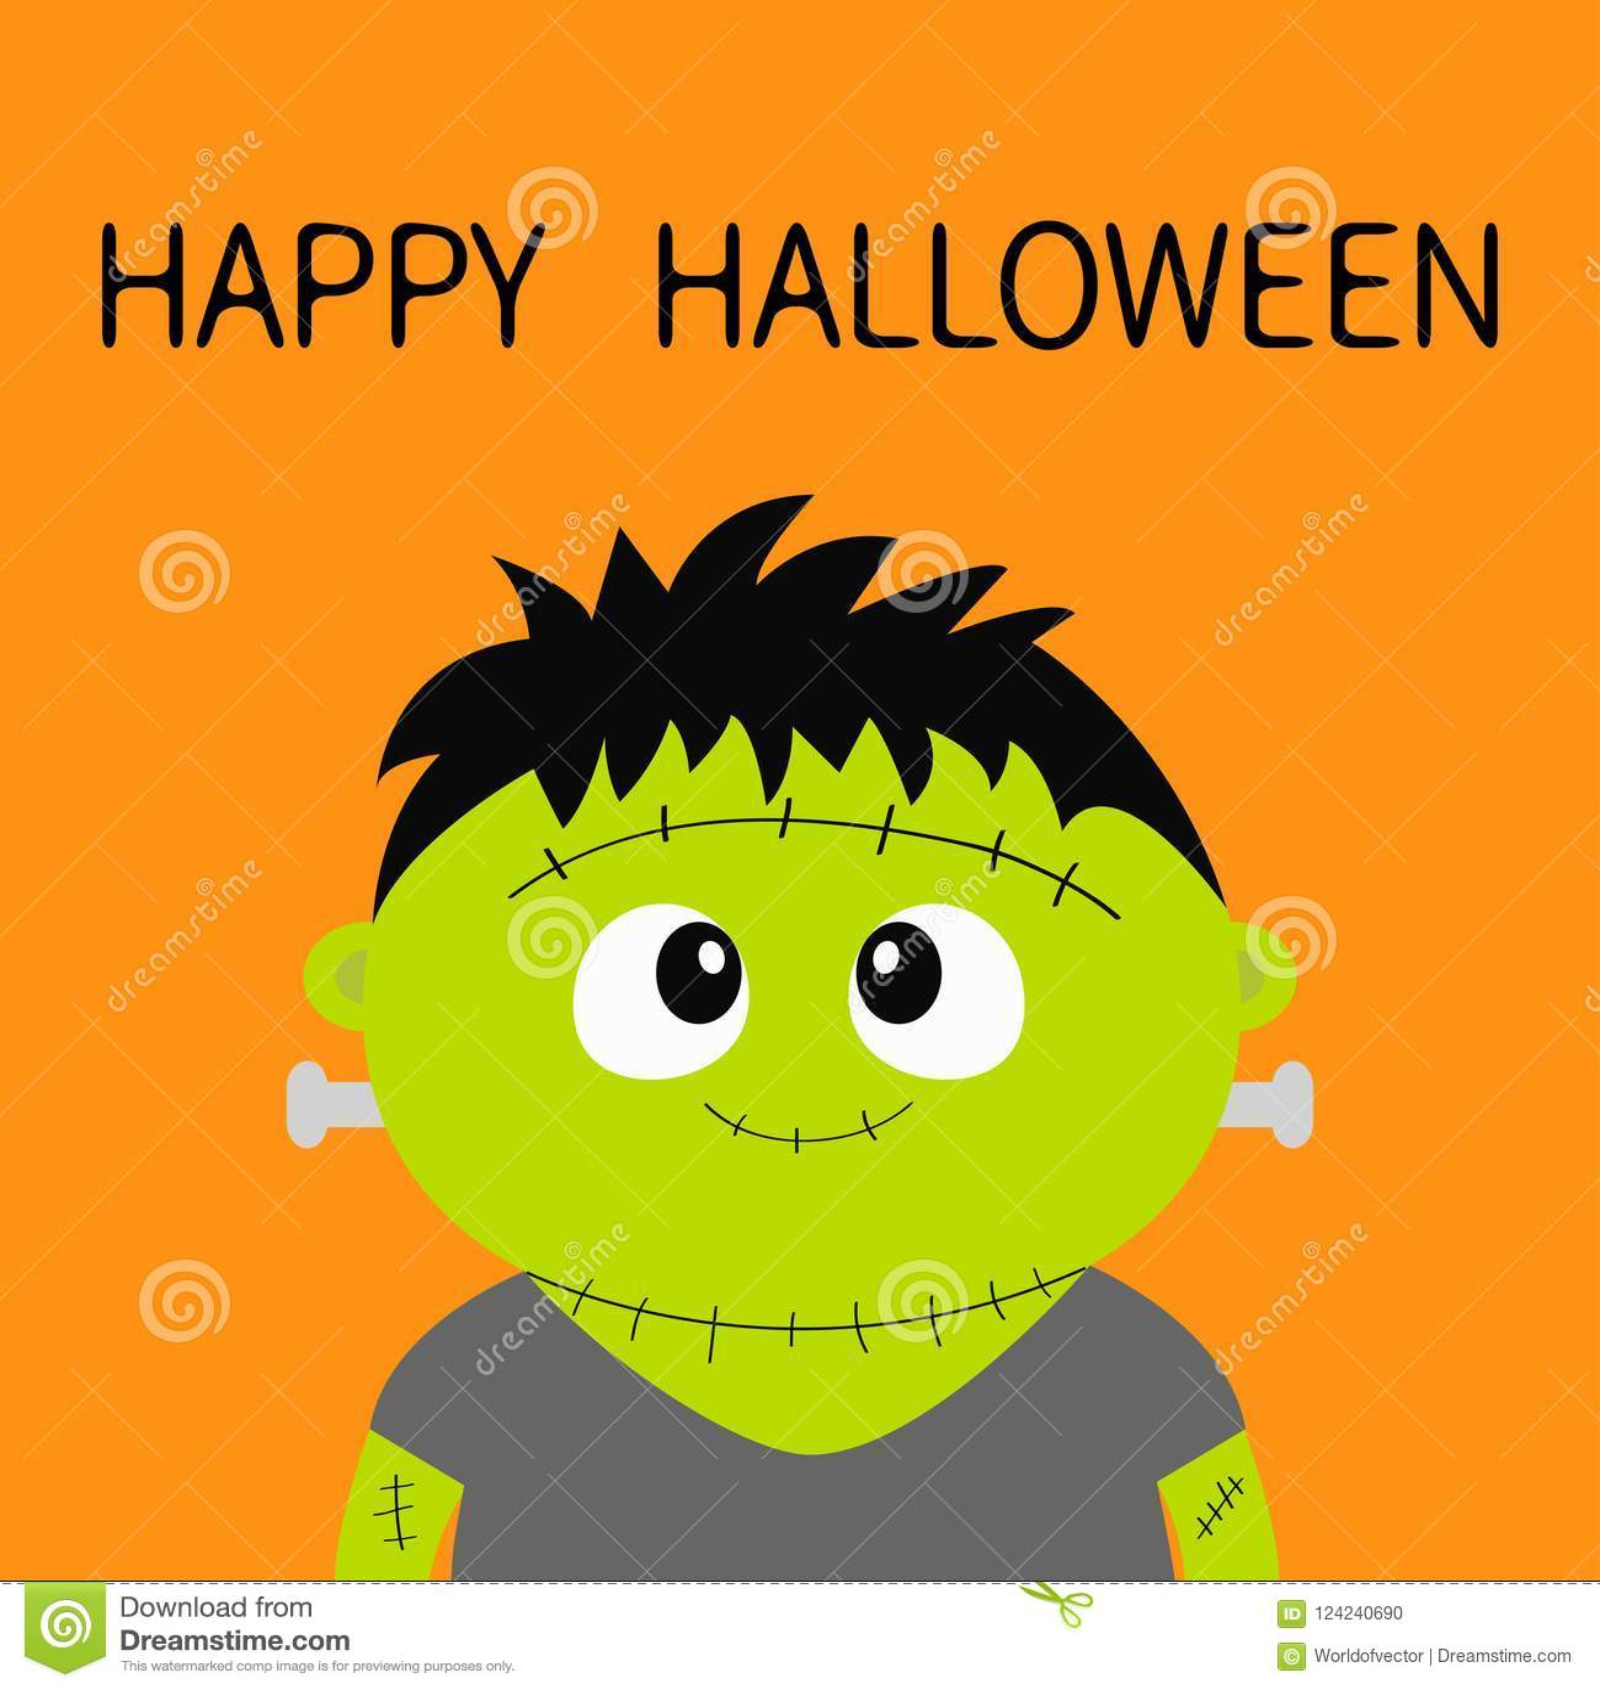 Look - Halloween Happy animation pictures video